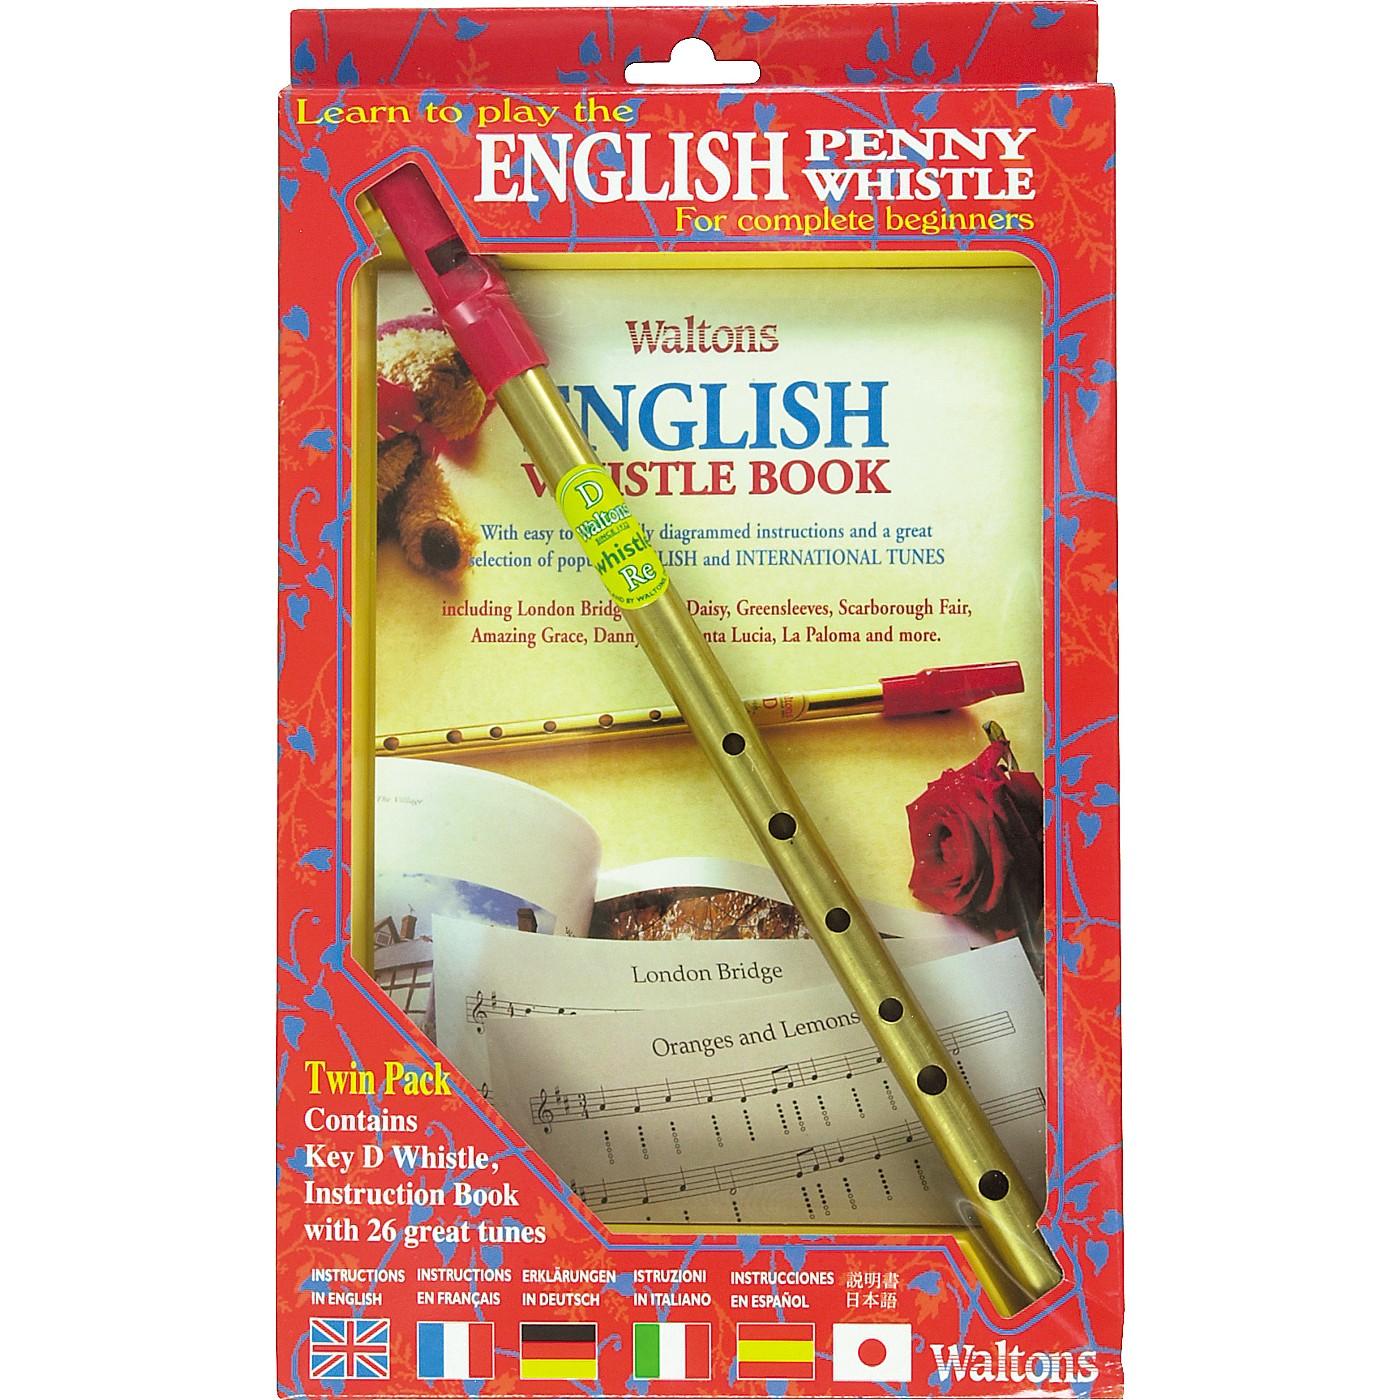 Waltons English Penny Whistle Value Pack thumbnail